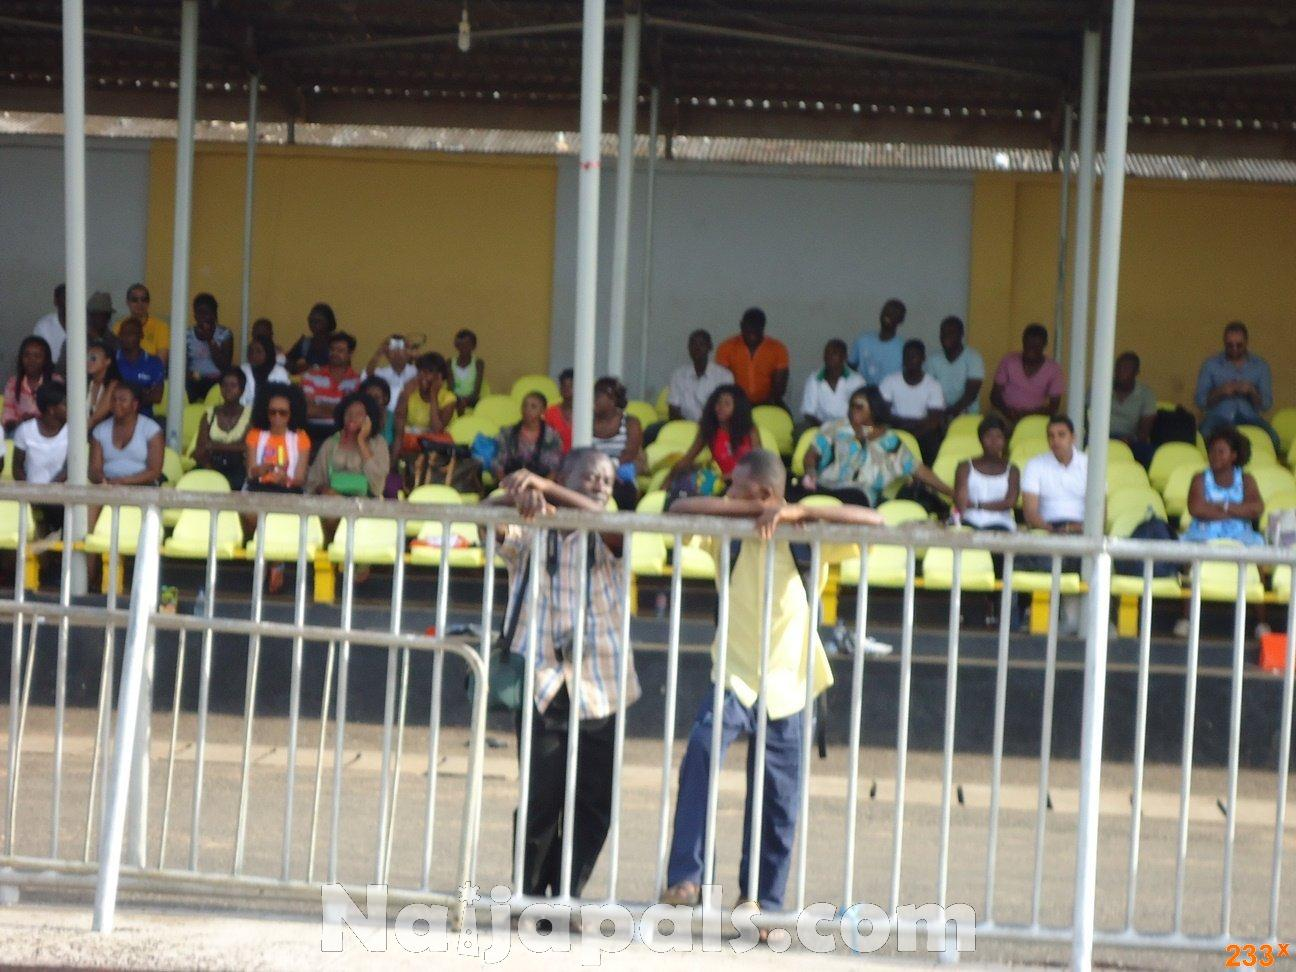 Ghana Female Celebrities Soccer Match 144